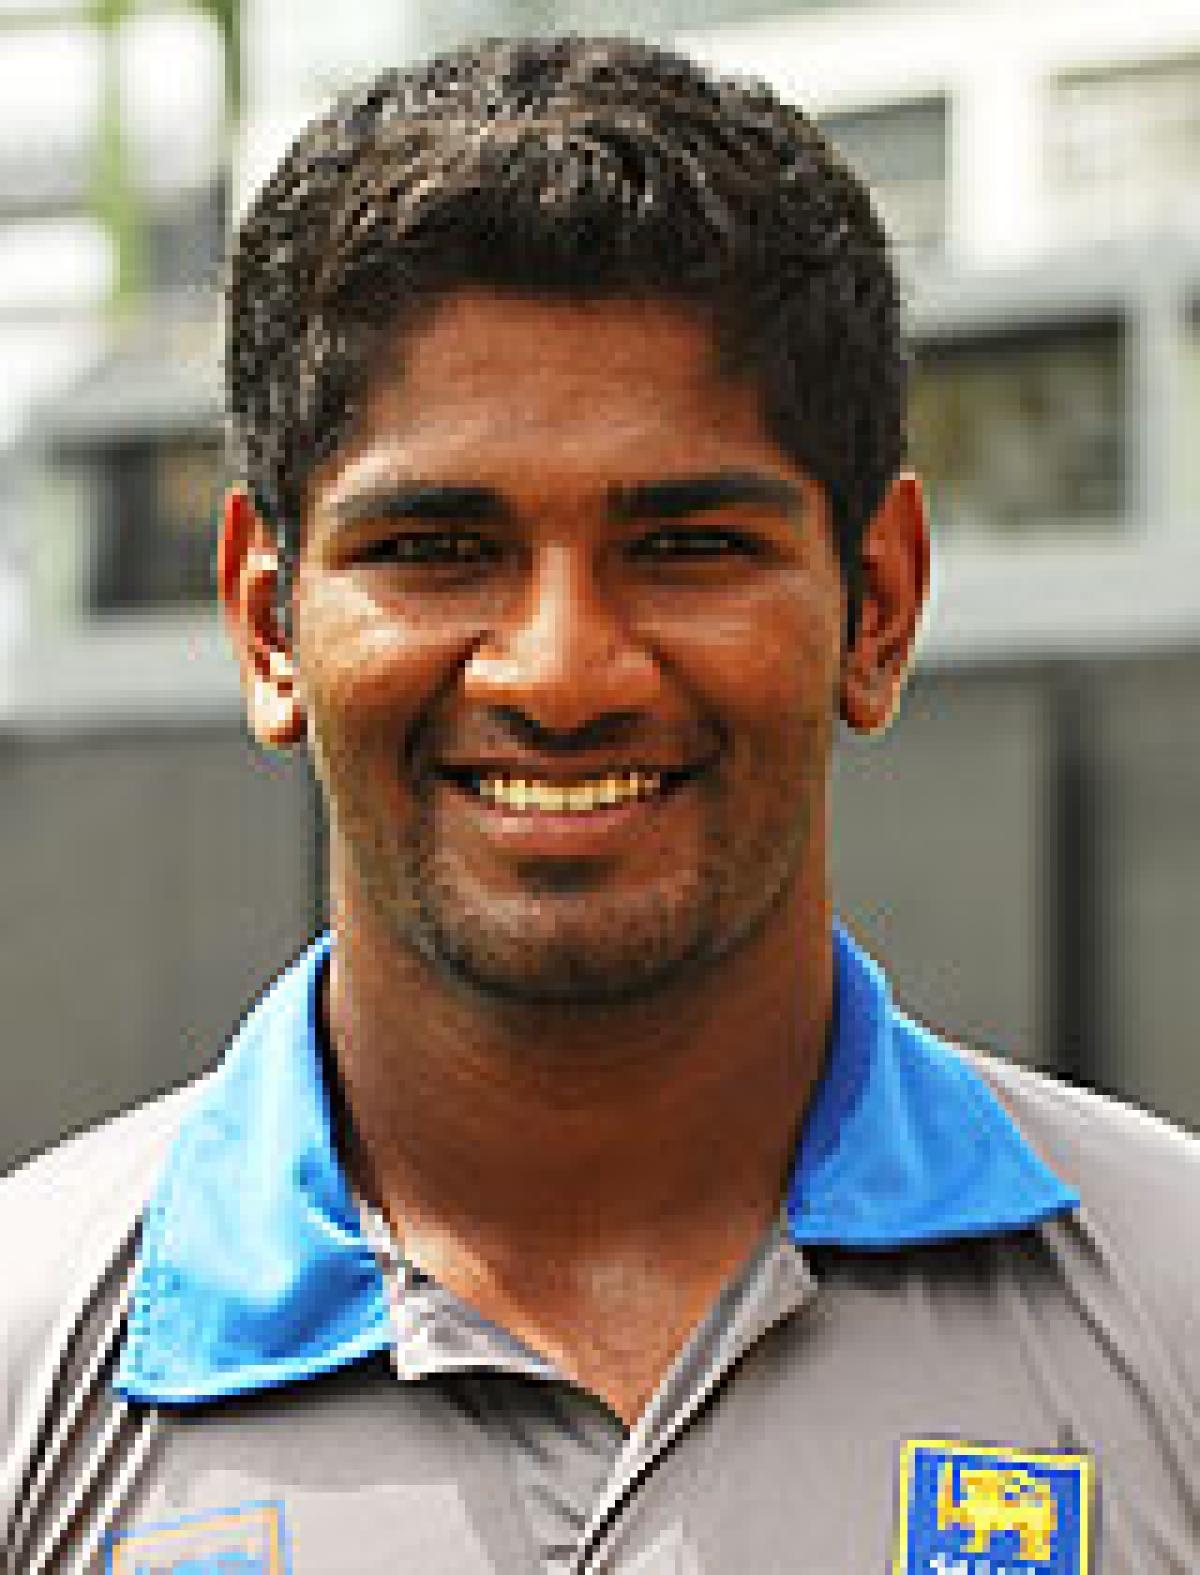 Drunk Lankan player in mid-air drama